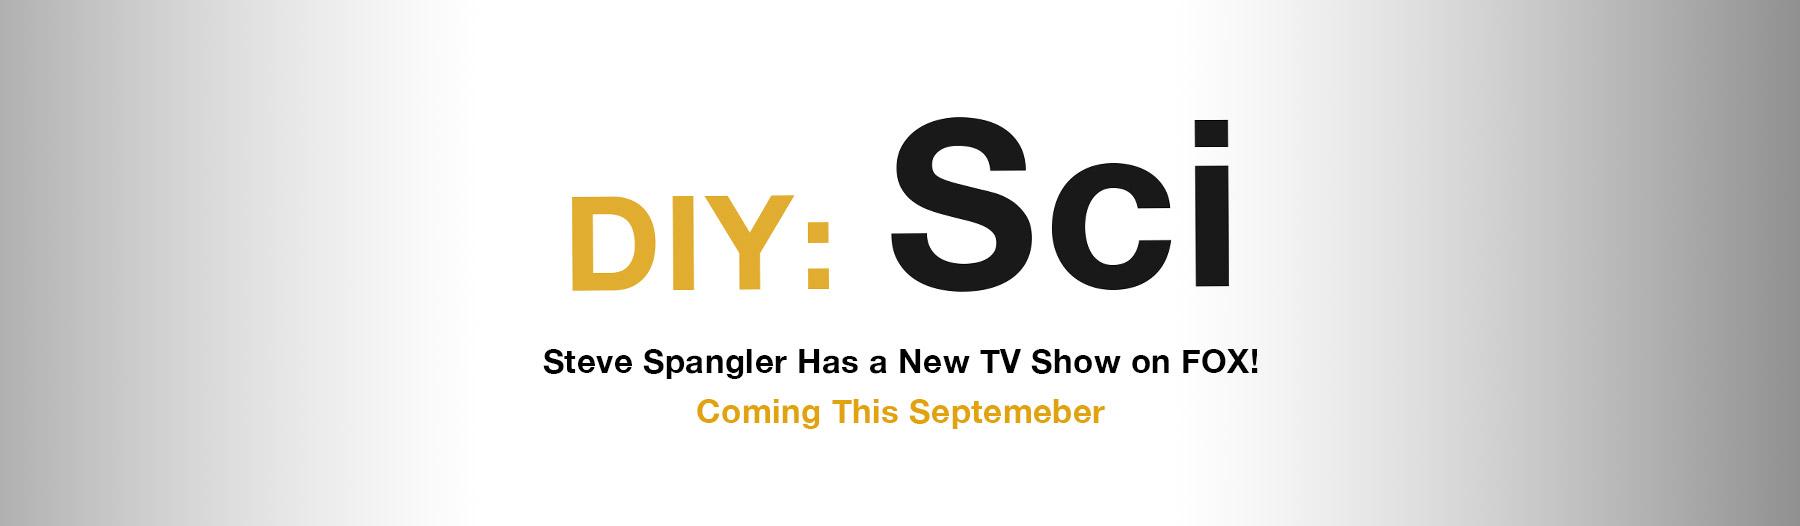 DIY Sci - Spangler TV Show